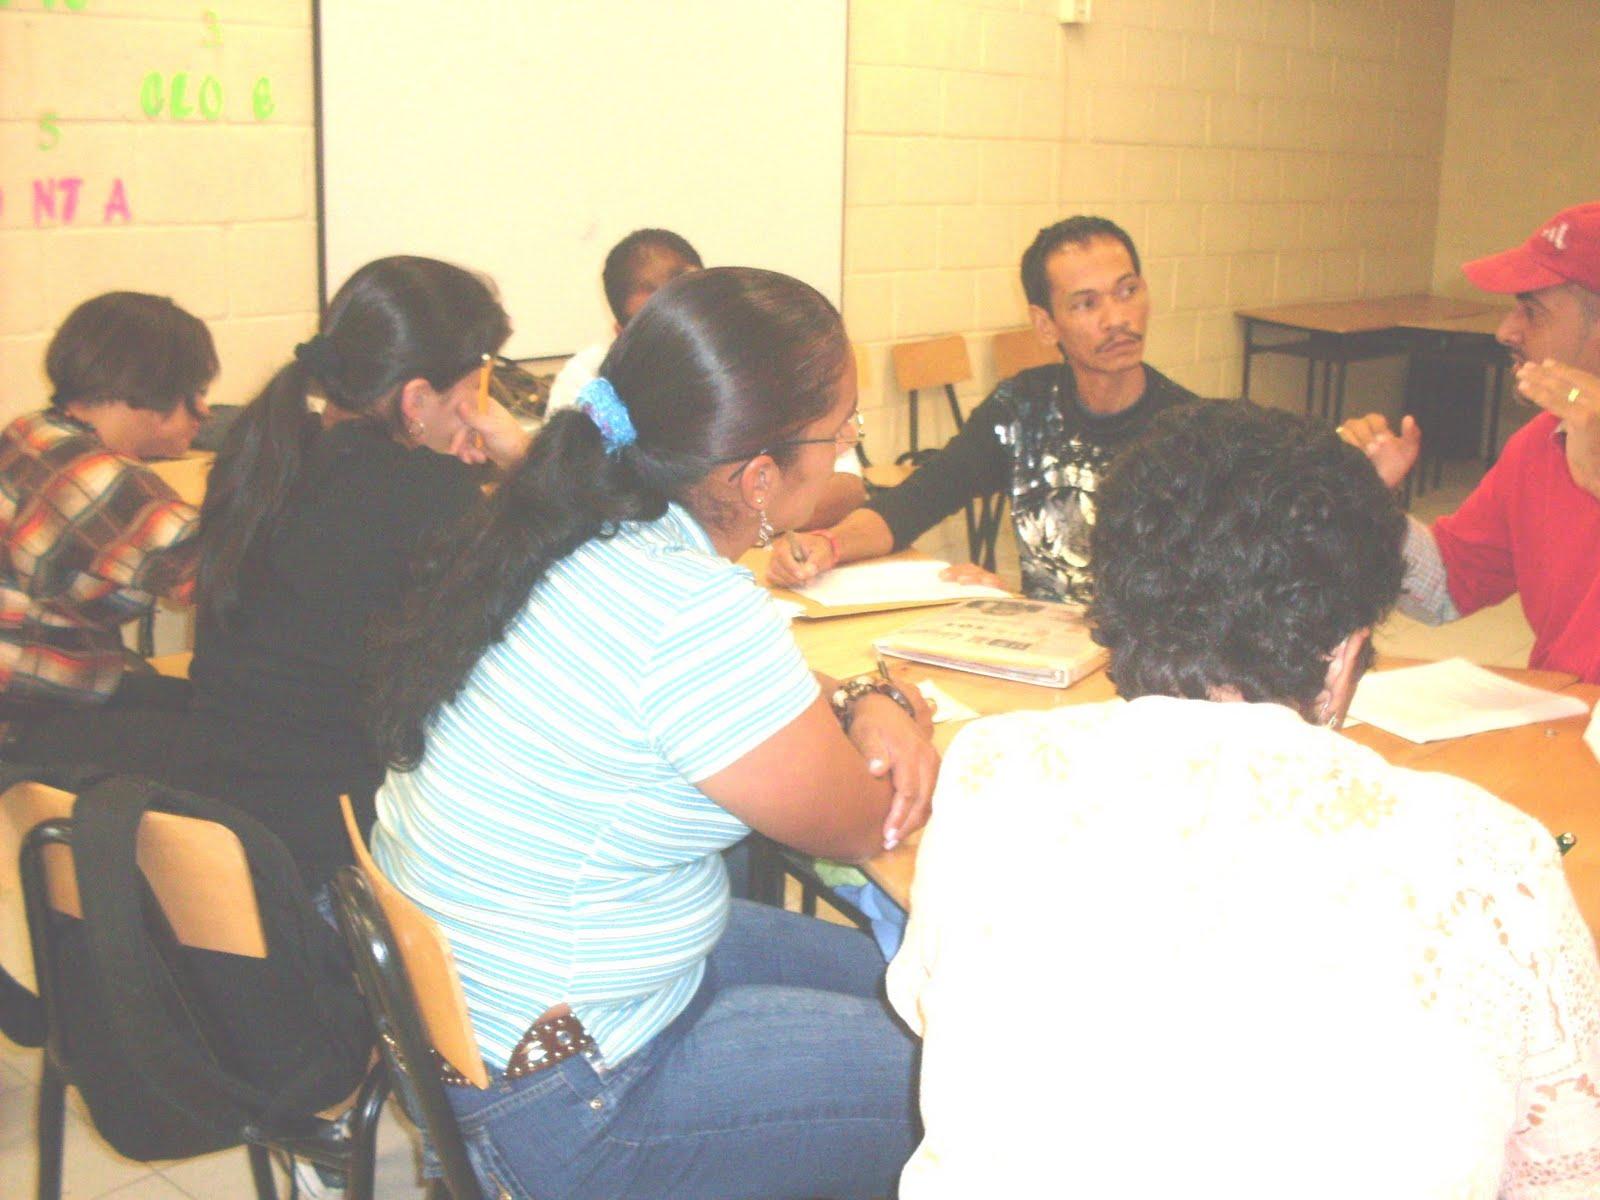 Colectivo, 17-07-09